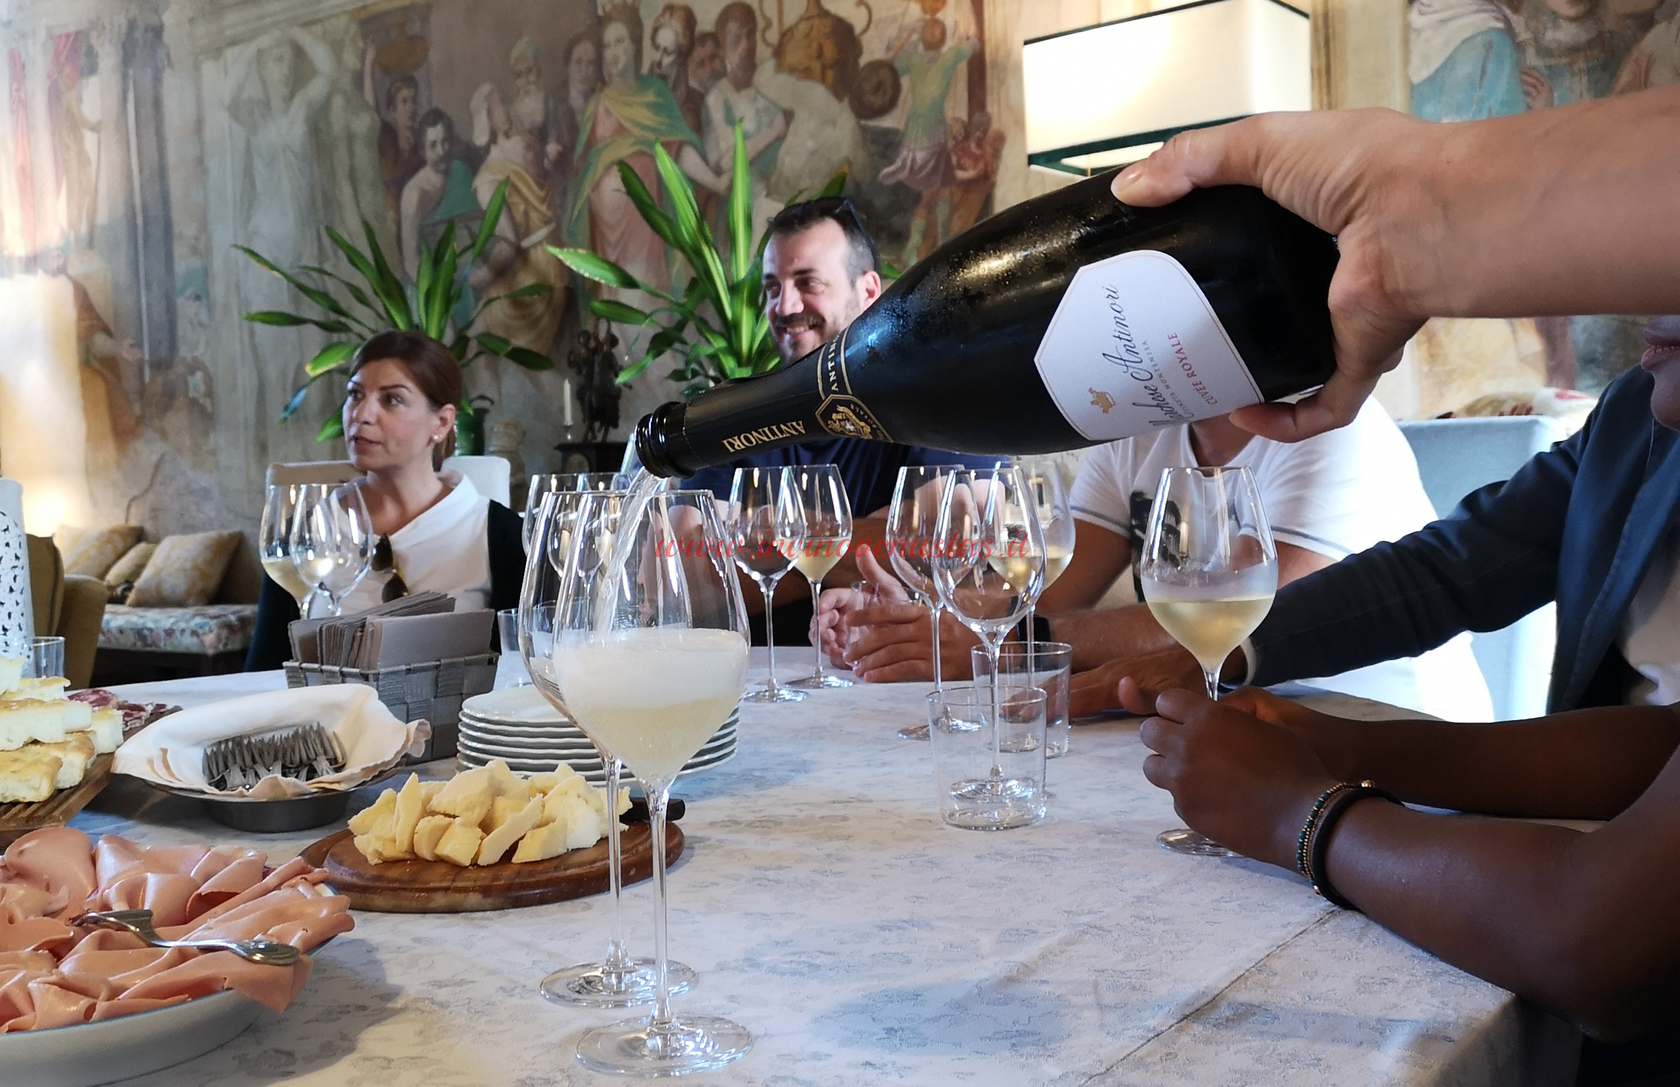 Degustazione vini Tenuta Montenisa Marchese Antinori Franciacorta